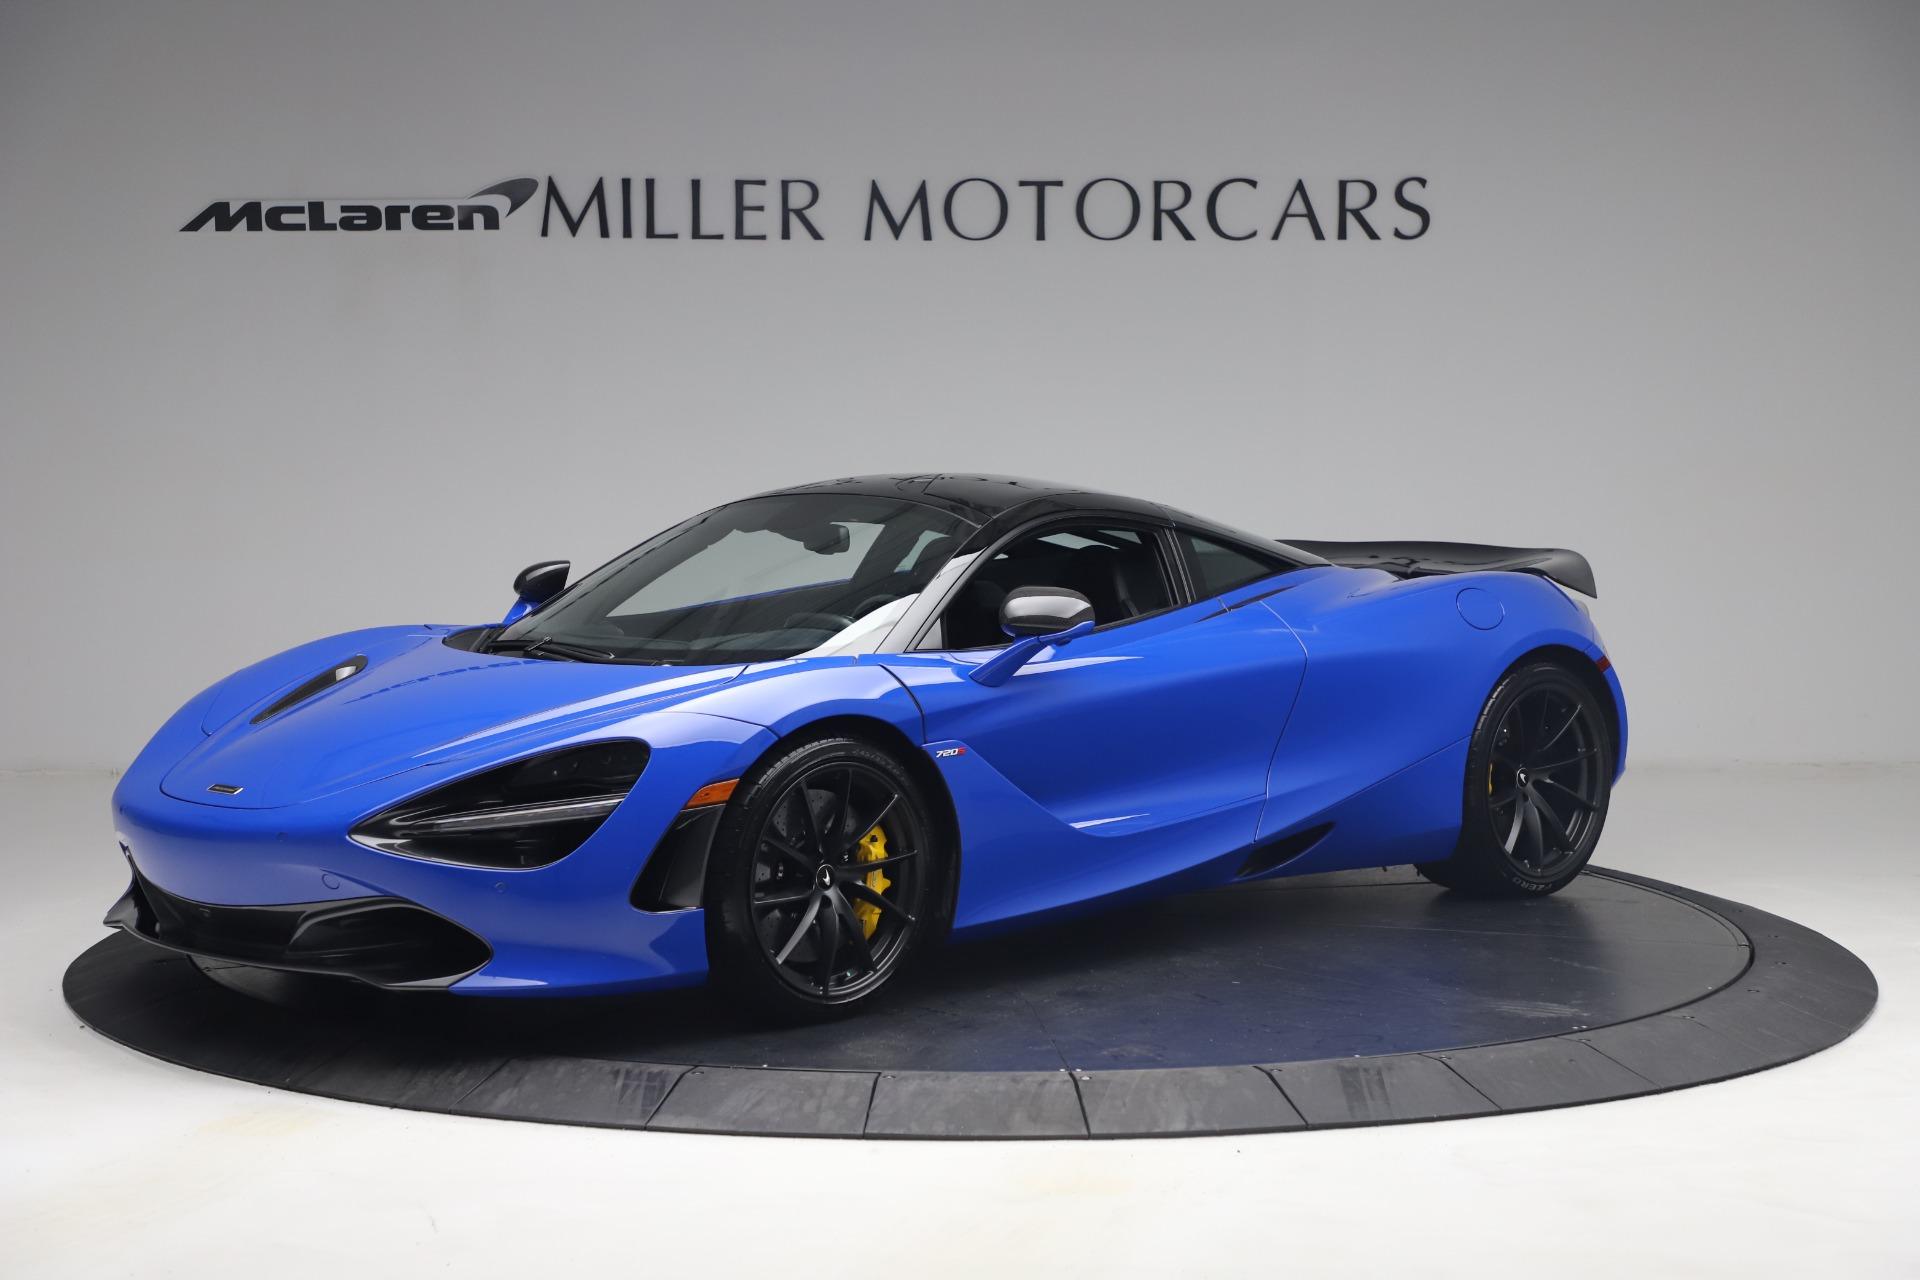 Used 2020 McLaren 720S Performace for sale $334,990 at Alfa Romeo of Westport in Westport CT 06880 1